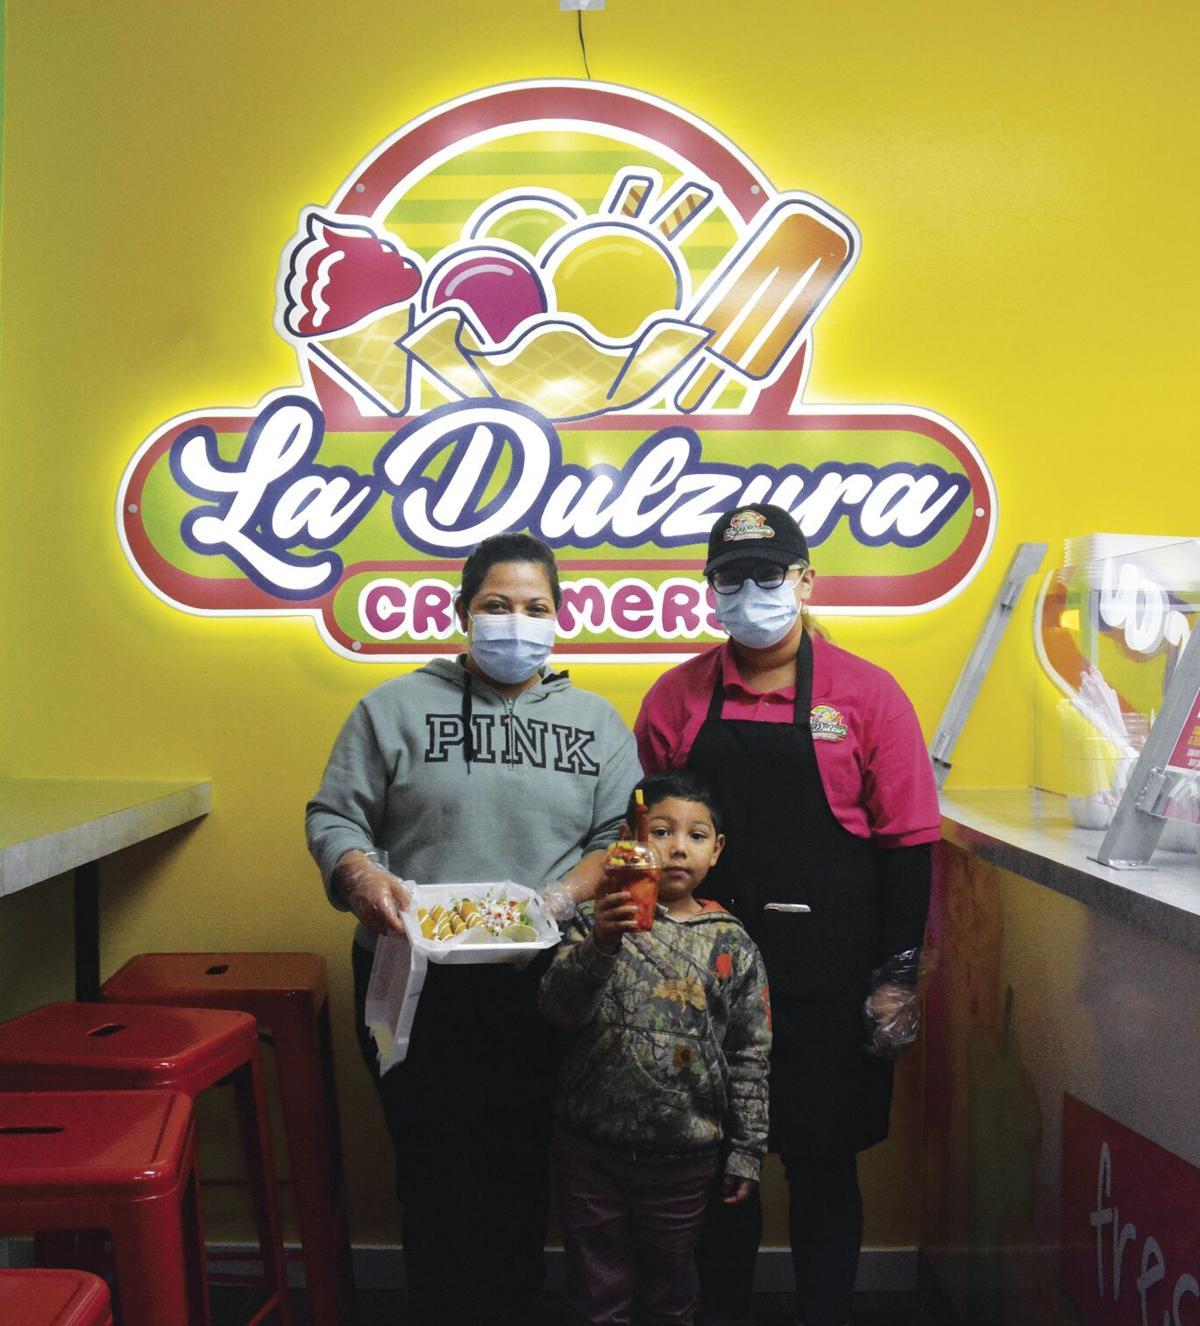 LaDulzura Creamery open for sweet, savory treats